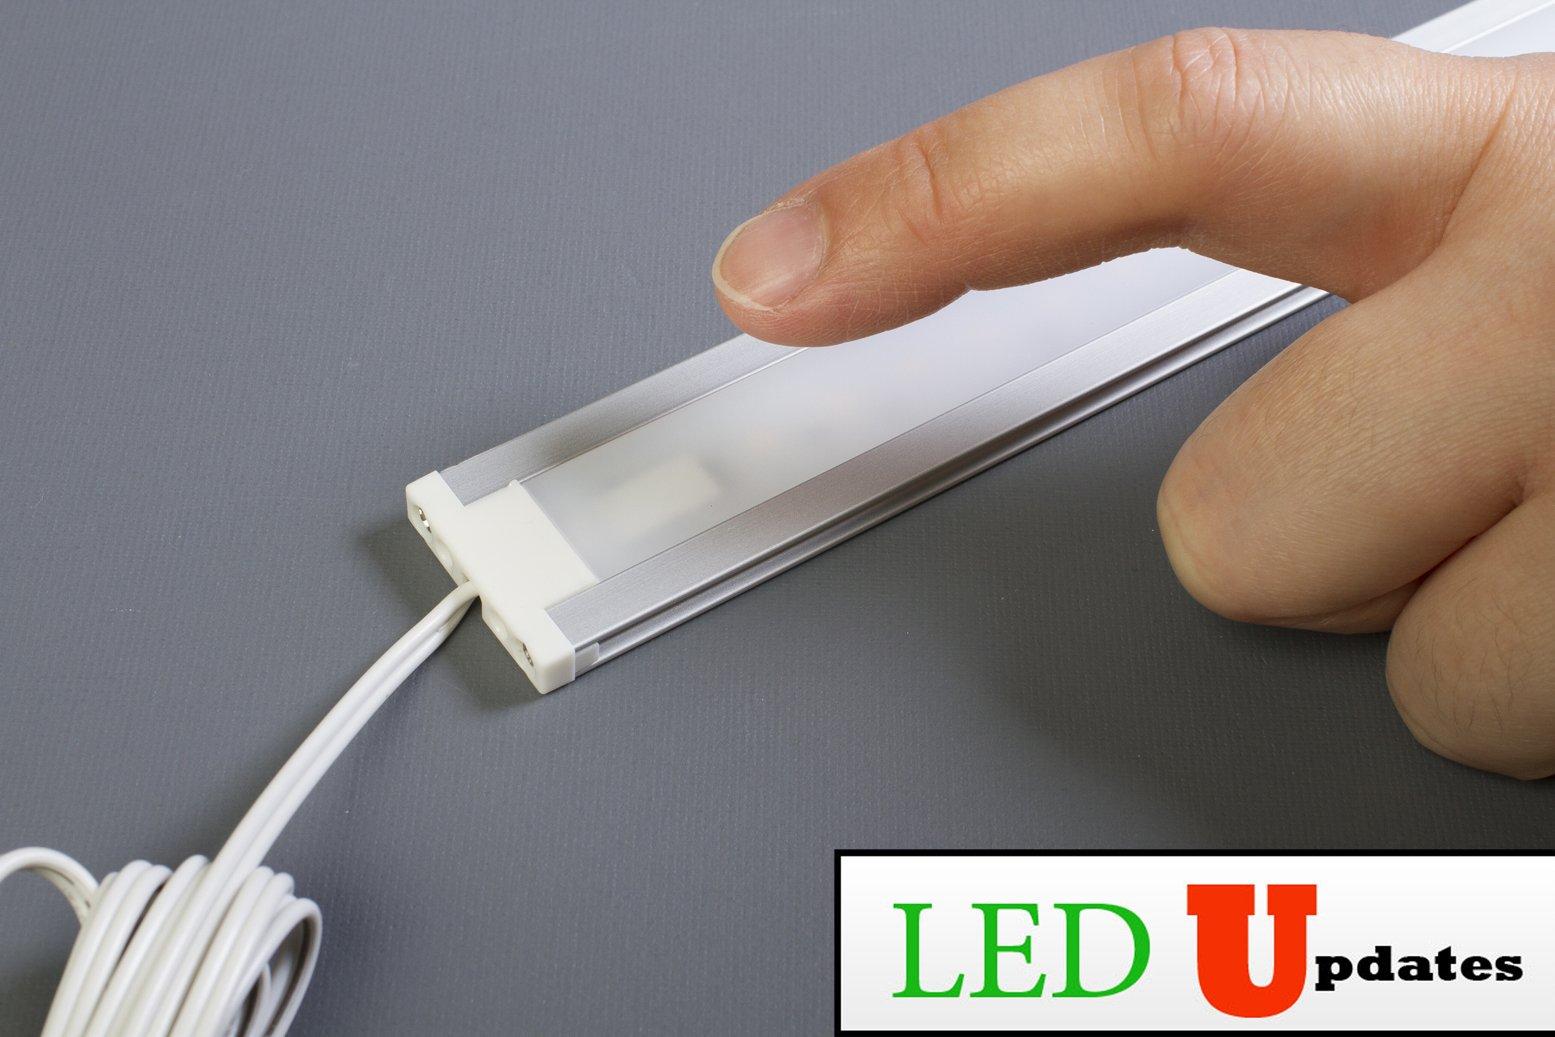 LEDupdates 24 inches Under Cabinet LED light for work shop & closet with UL Power adapter by LEDUPDATES (Image #6)